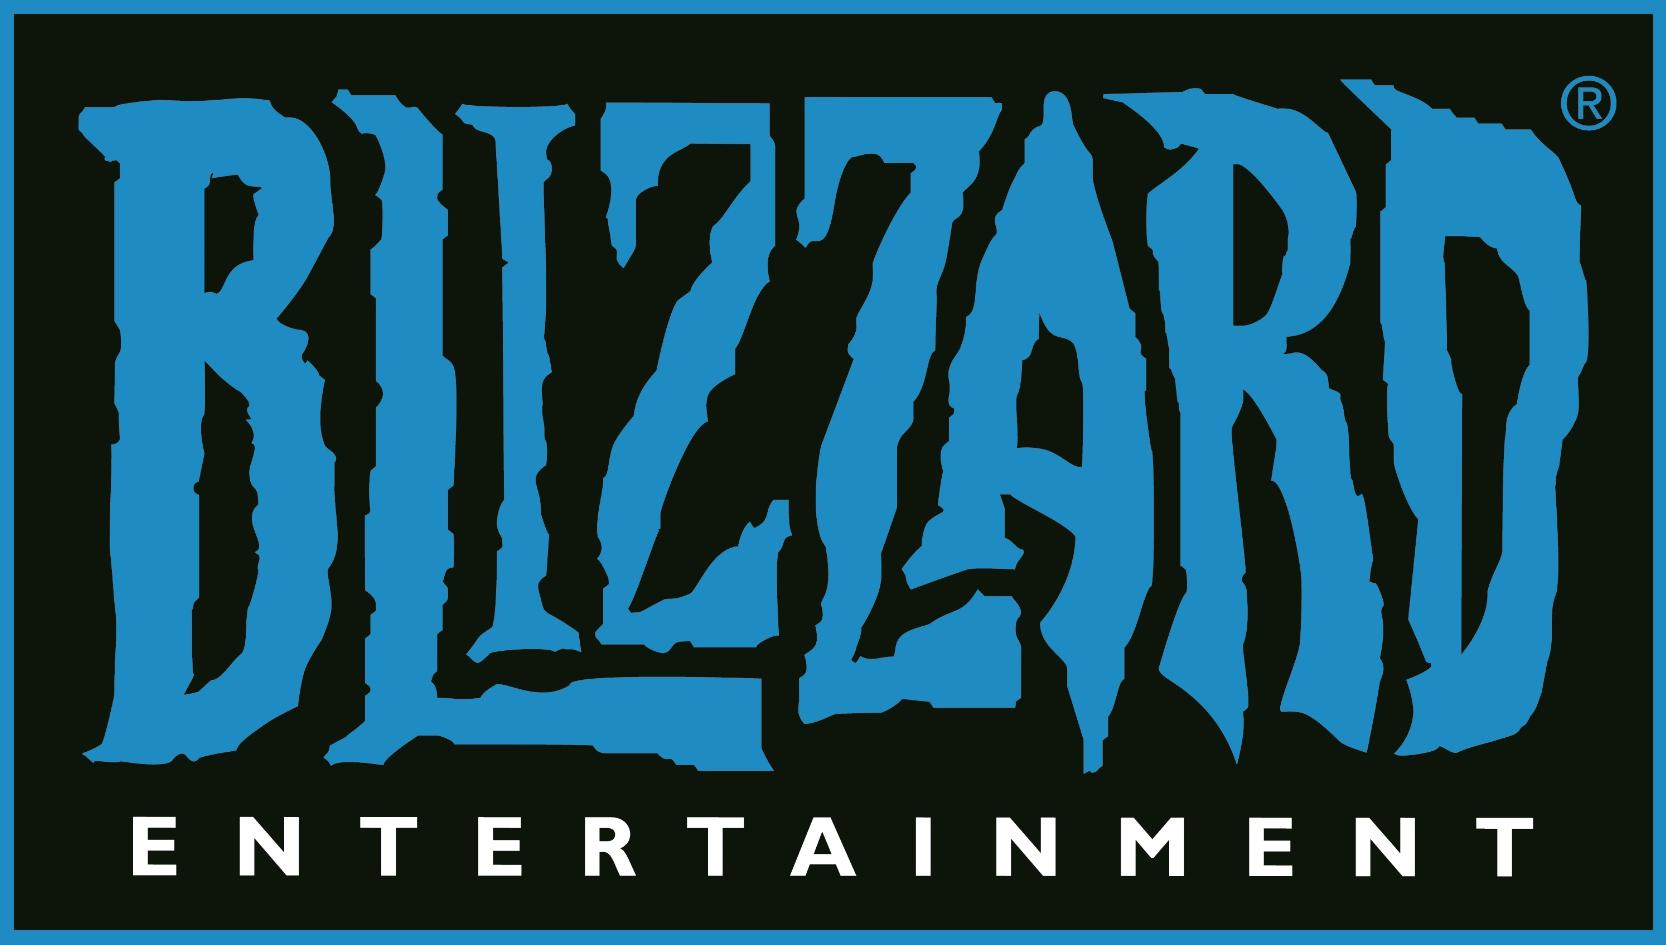 2017-03-24 - Image02 - Blizzard